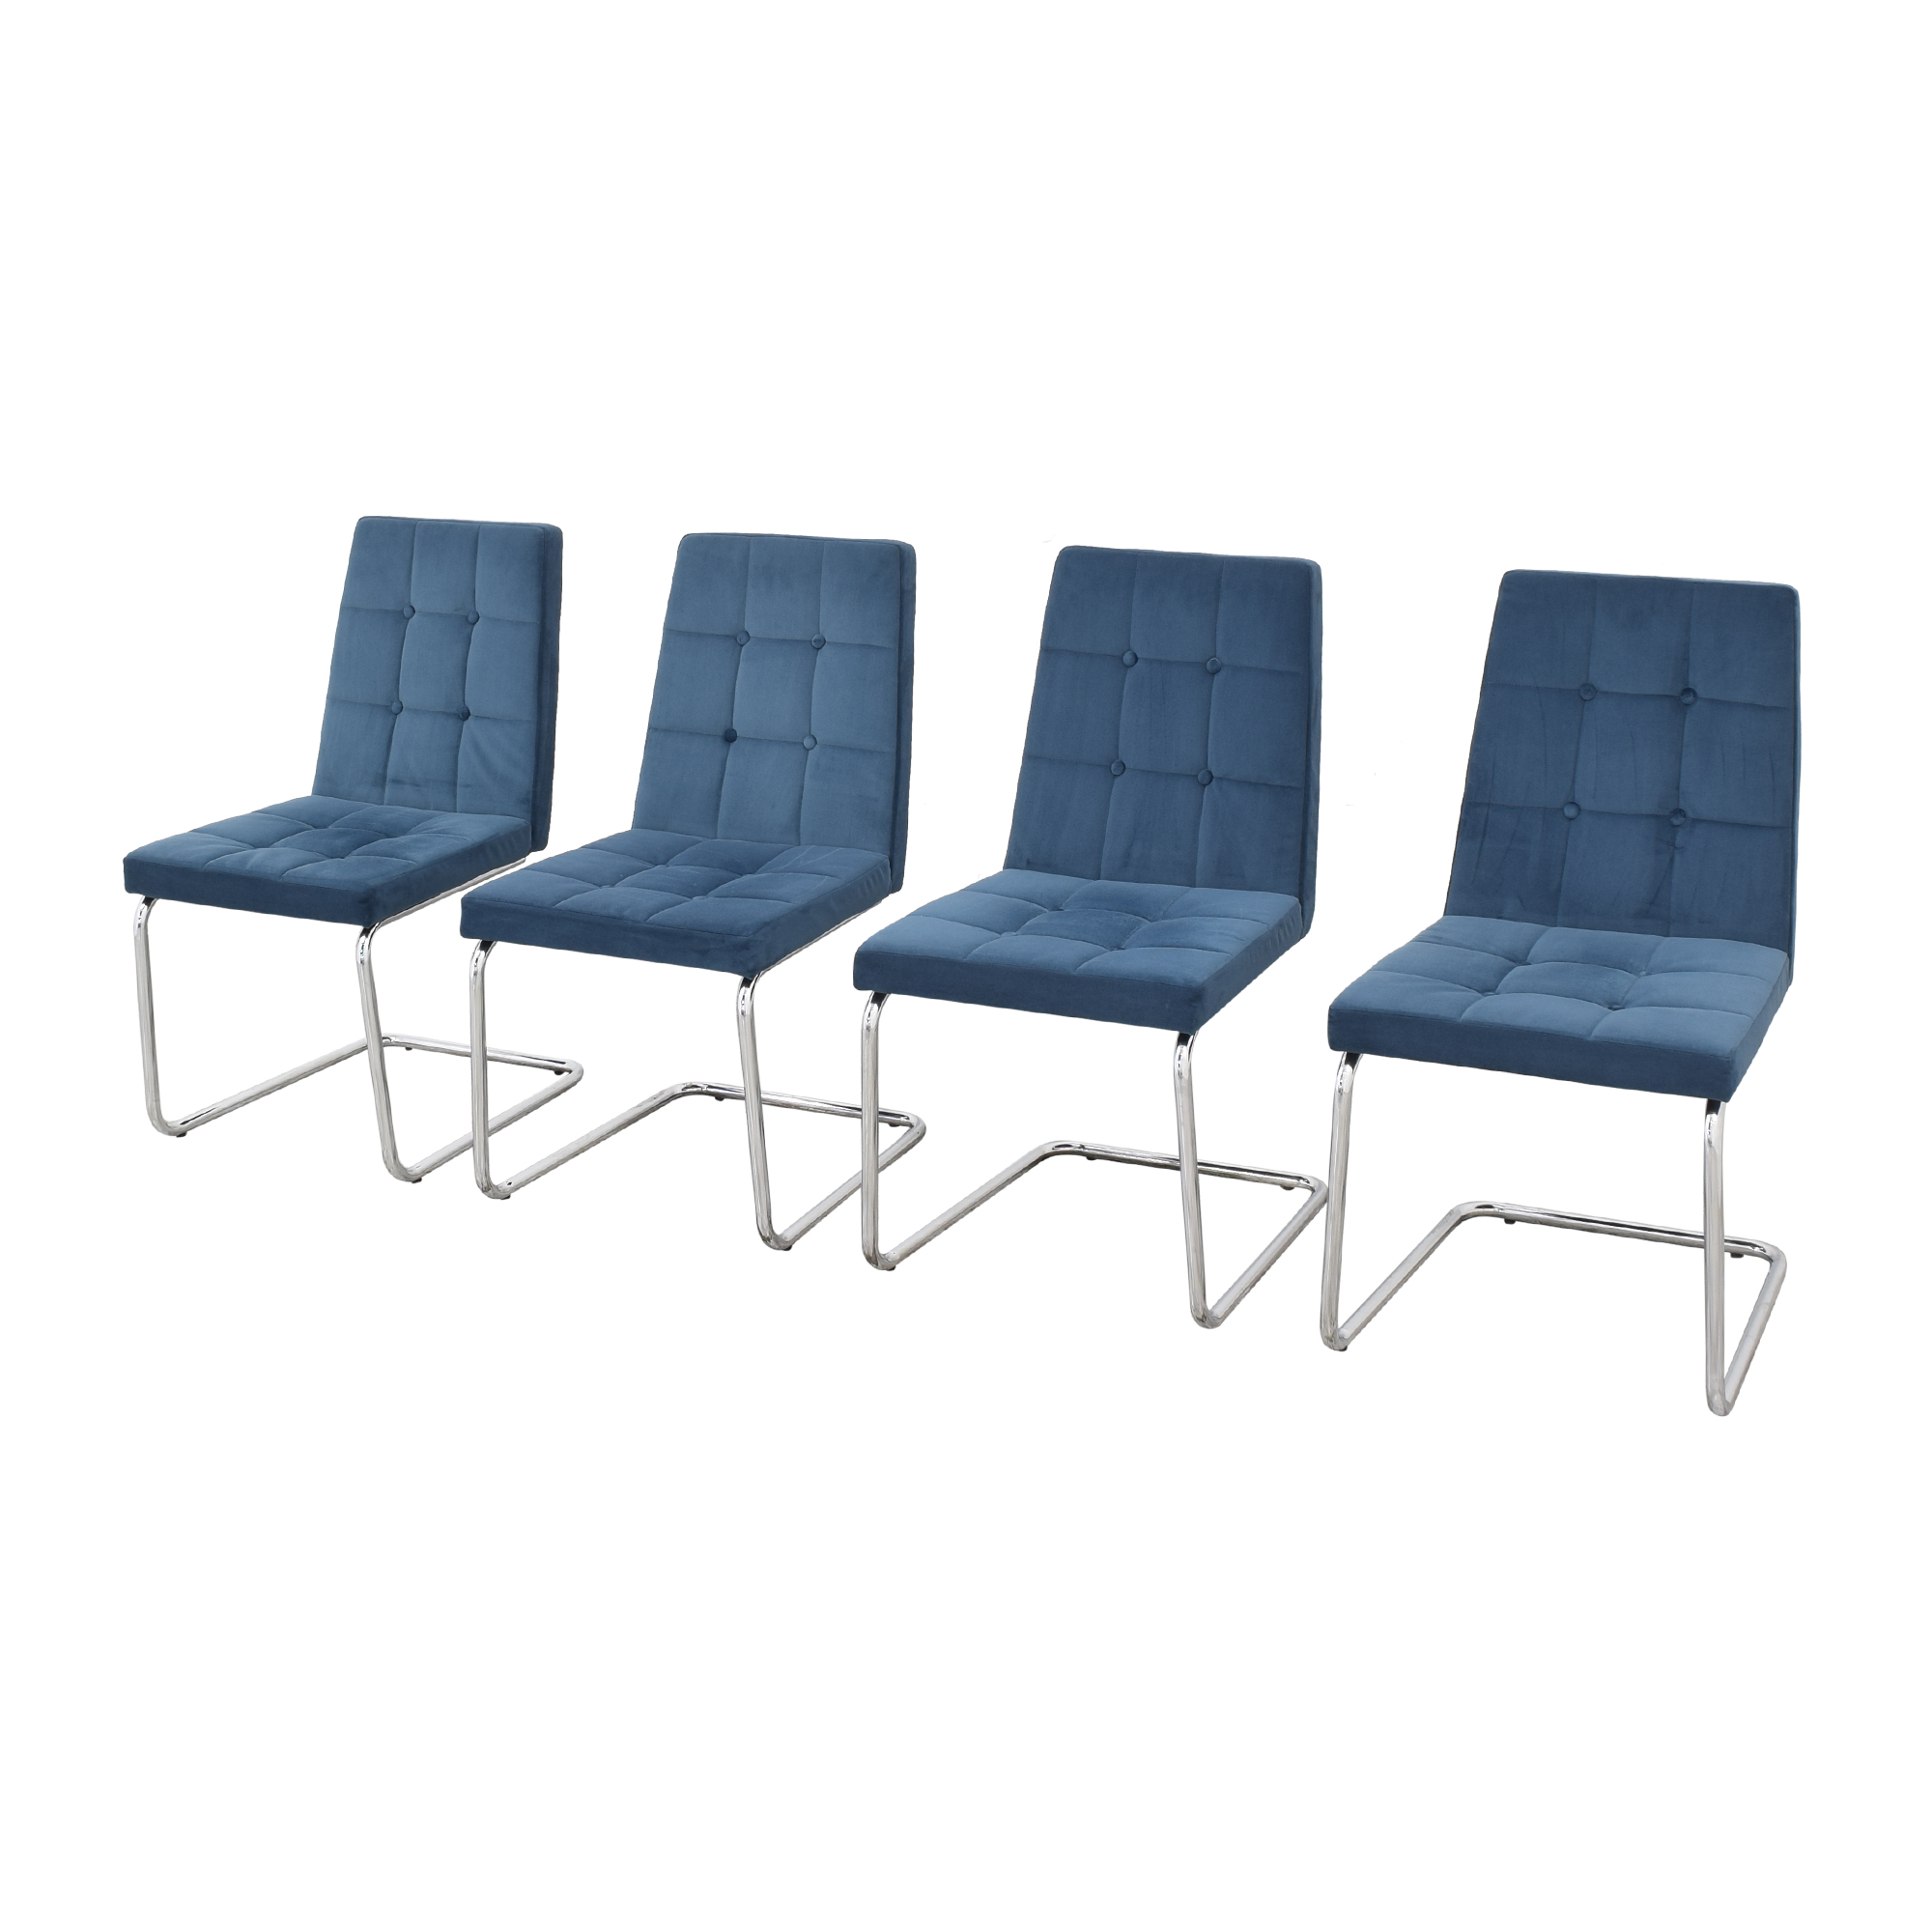 CB2 CB2 Roya Chairs Slate Blue blue